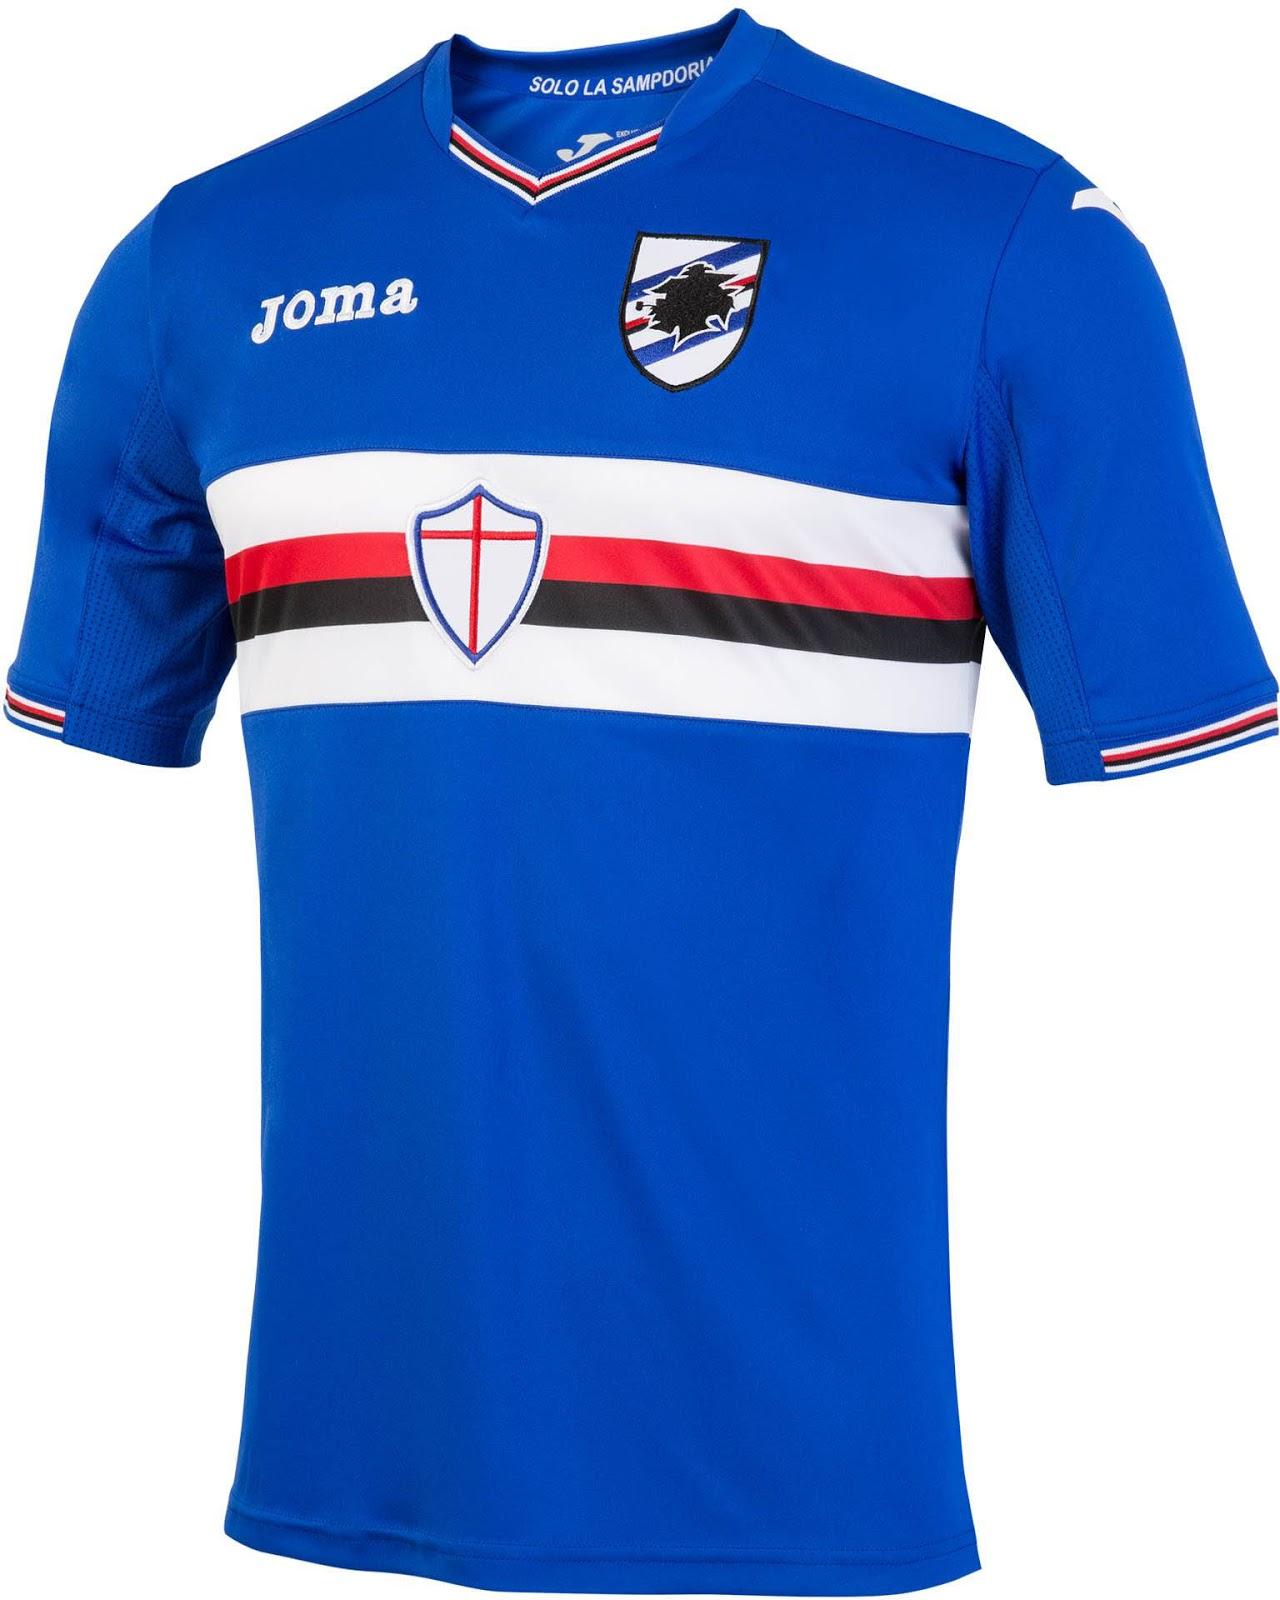 Sampdoria 16-17 Home, Away and Third Kits Released - Footy Headlines